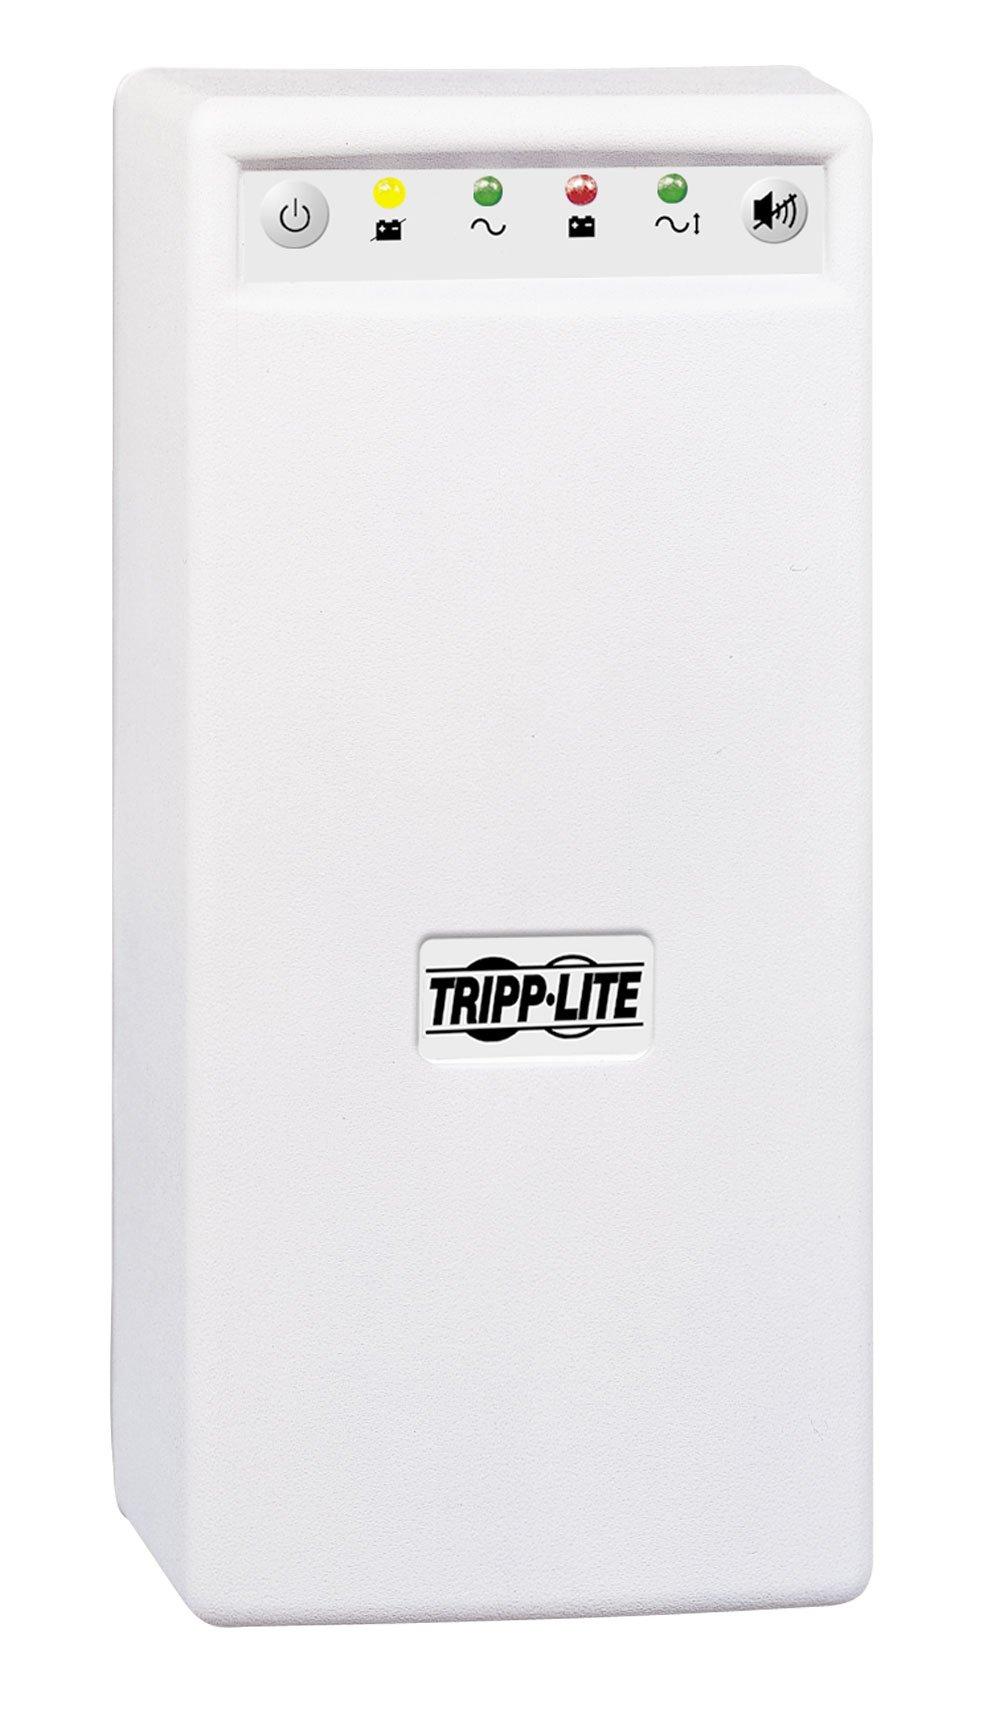 Tripp Lite OMNISMART350HG Omni Smart 350VA Hospital-Grade Line-Interactive UPS (4 Outlets) by Tripp Lite